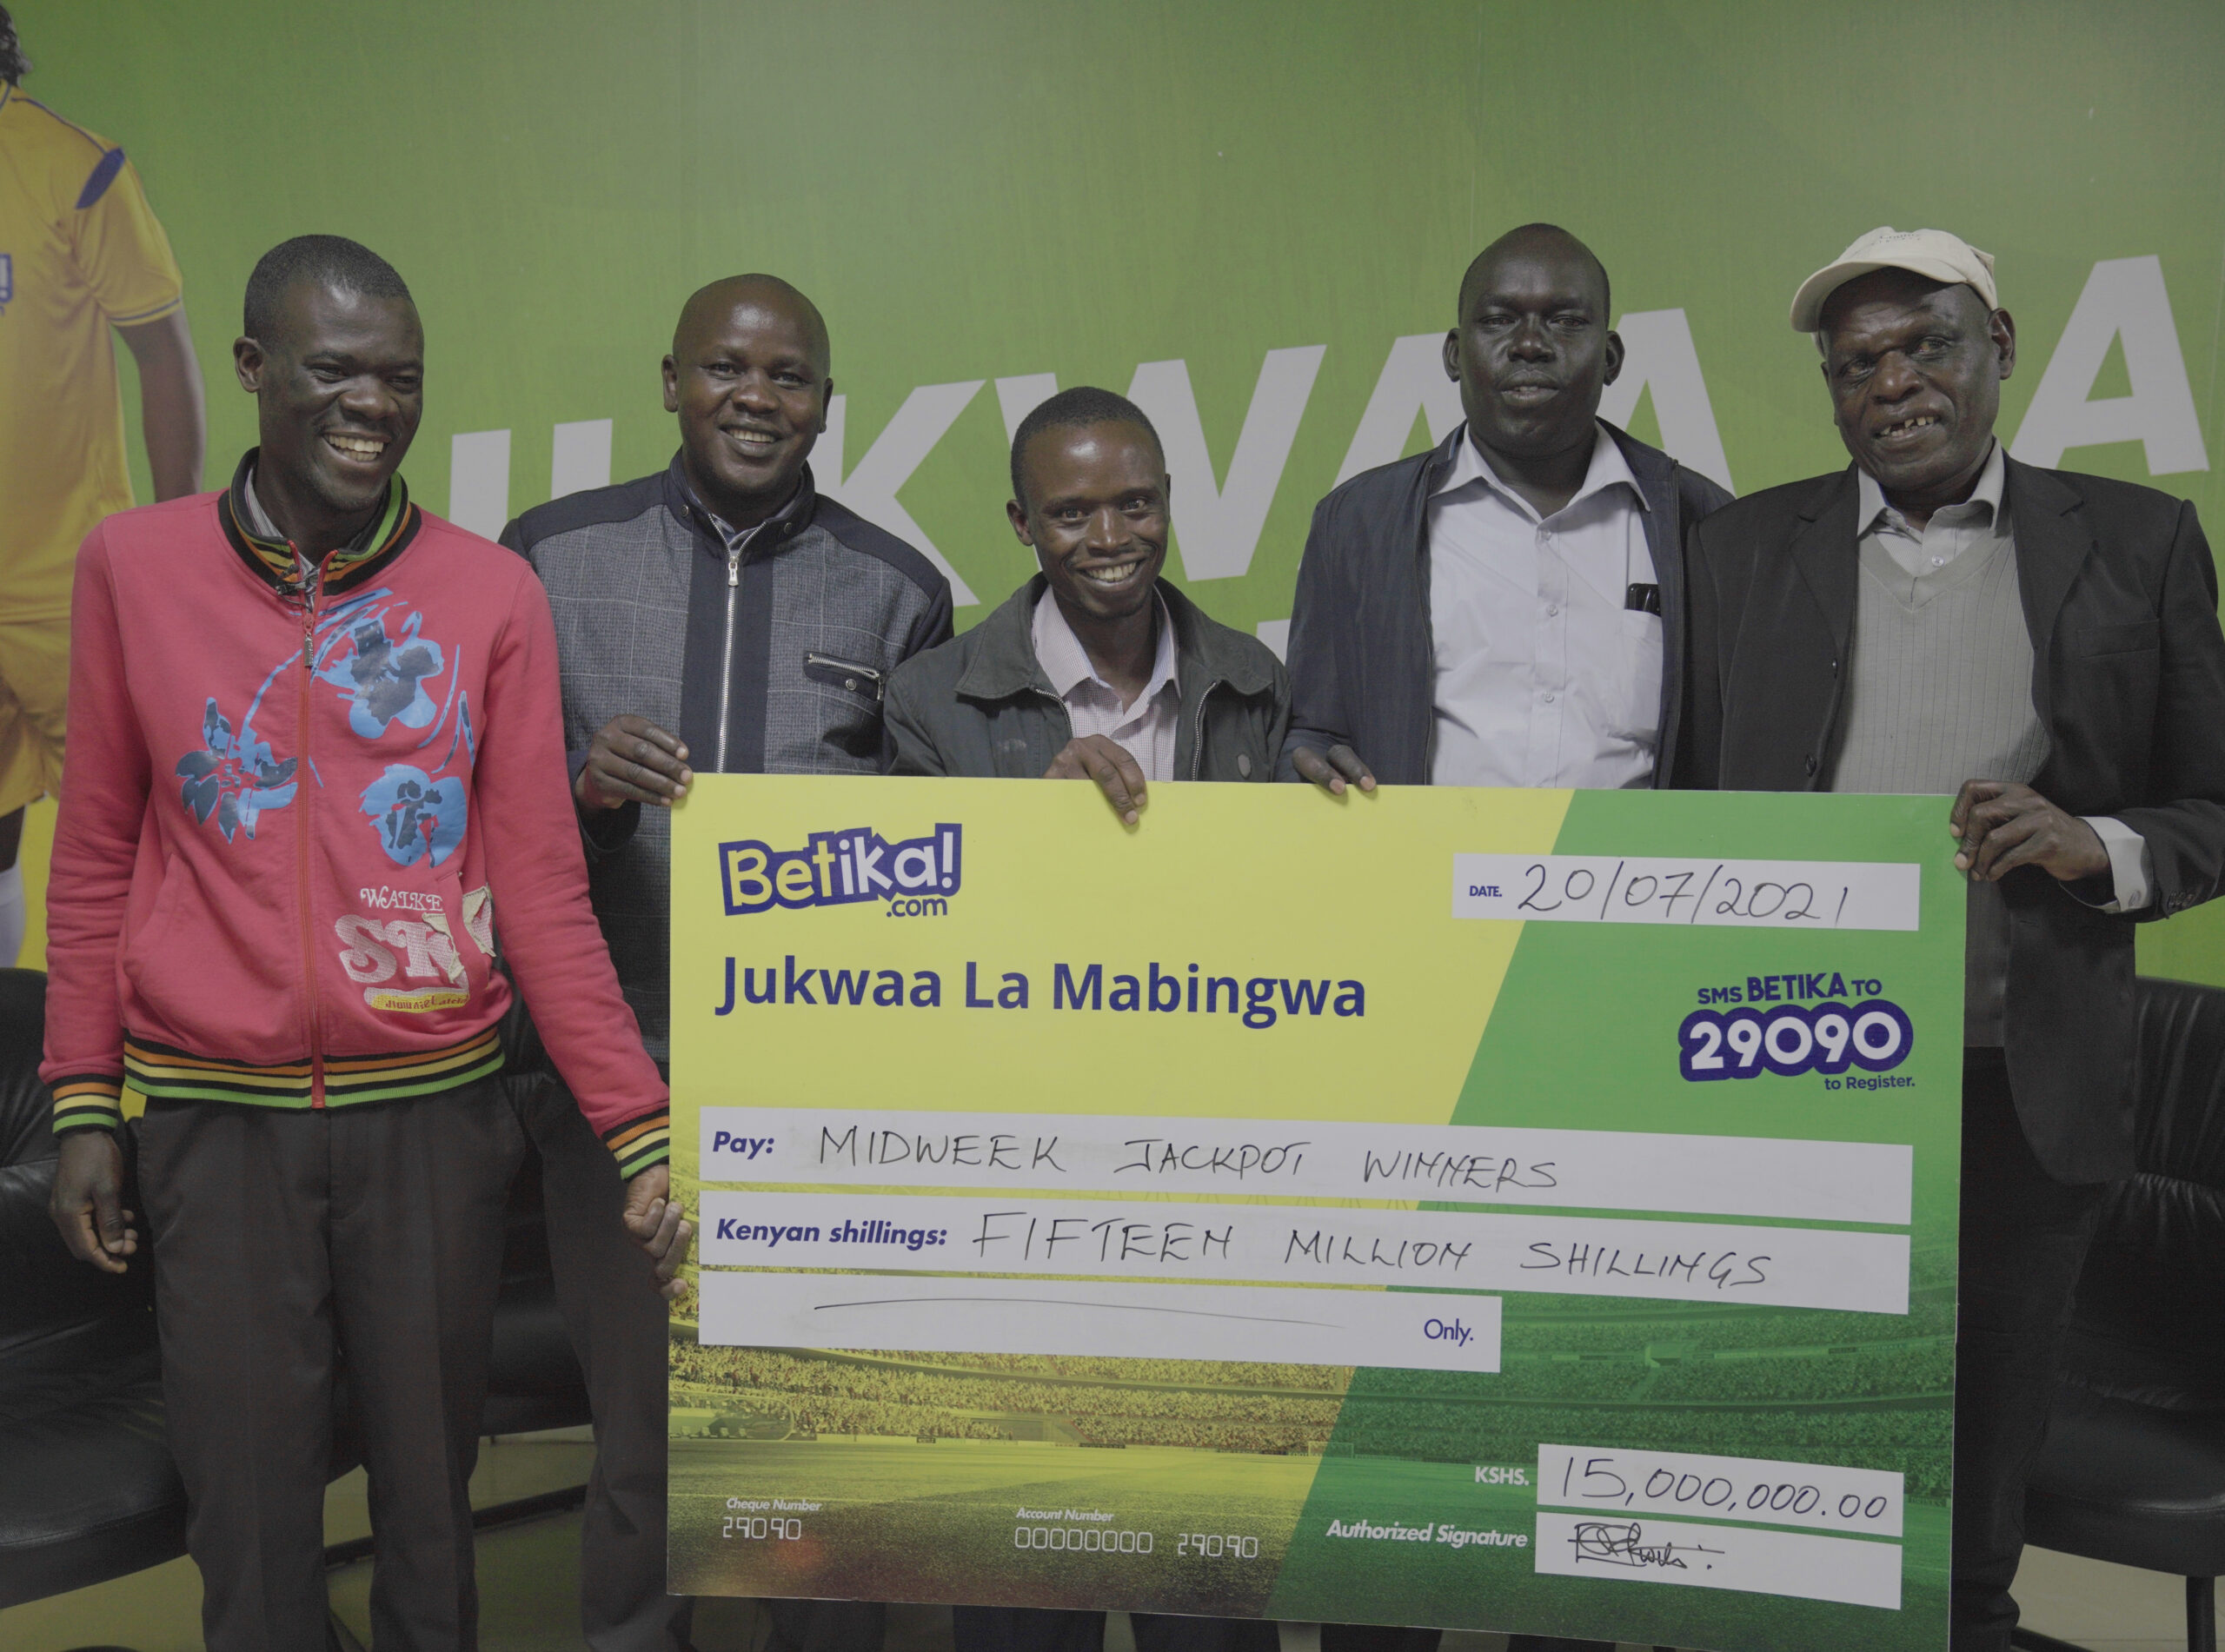 A Quintet of Winners Bag Betika Ksh15 Midweek Jackpot